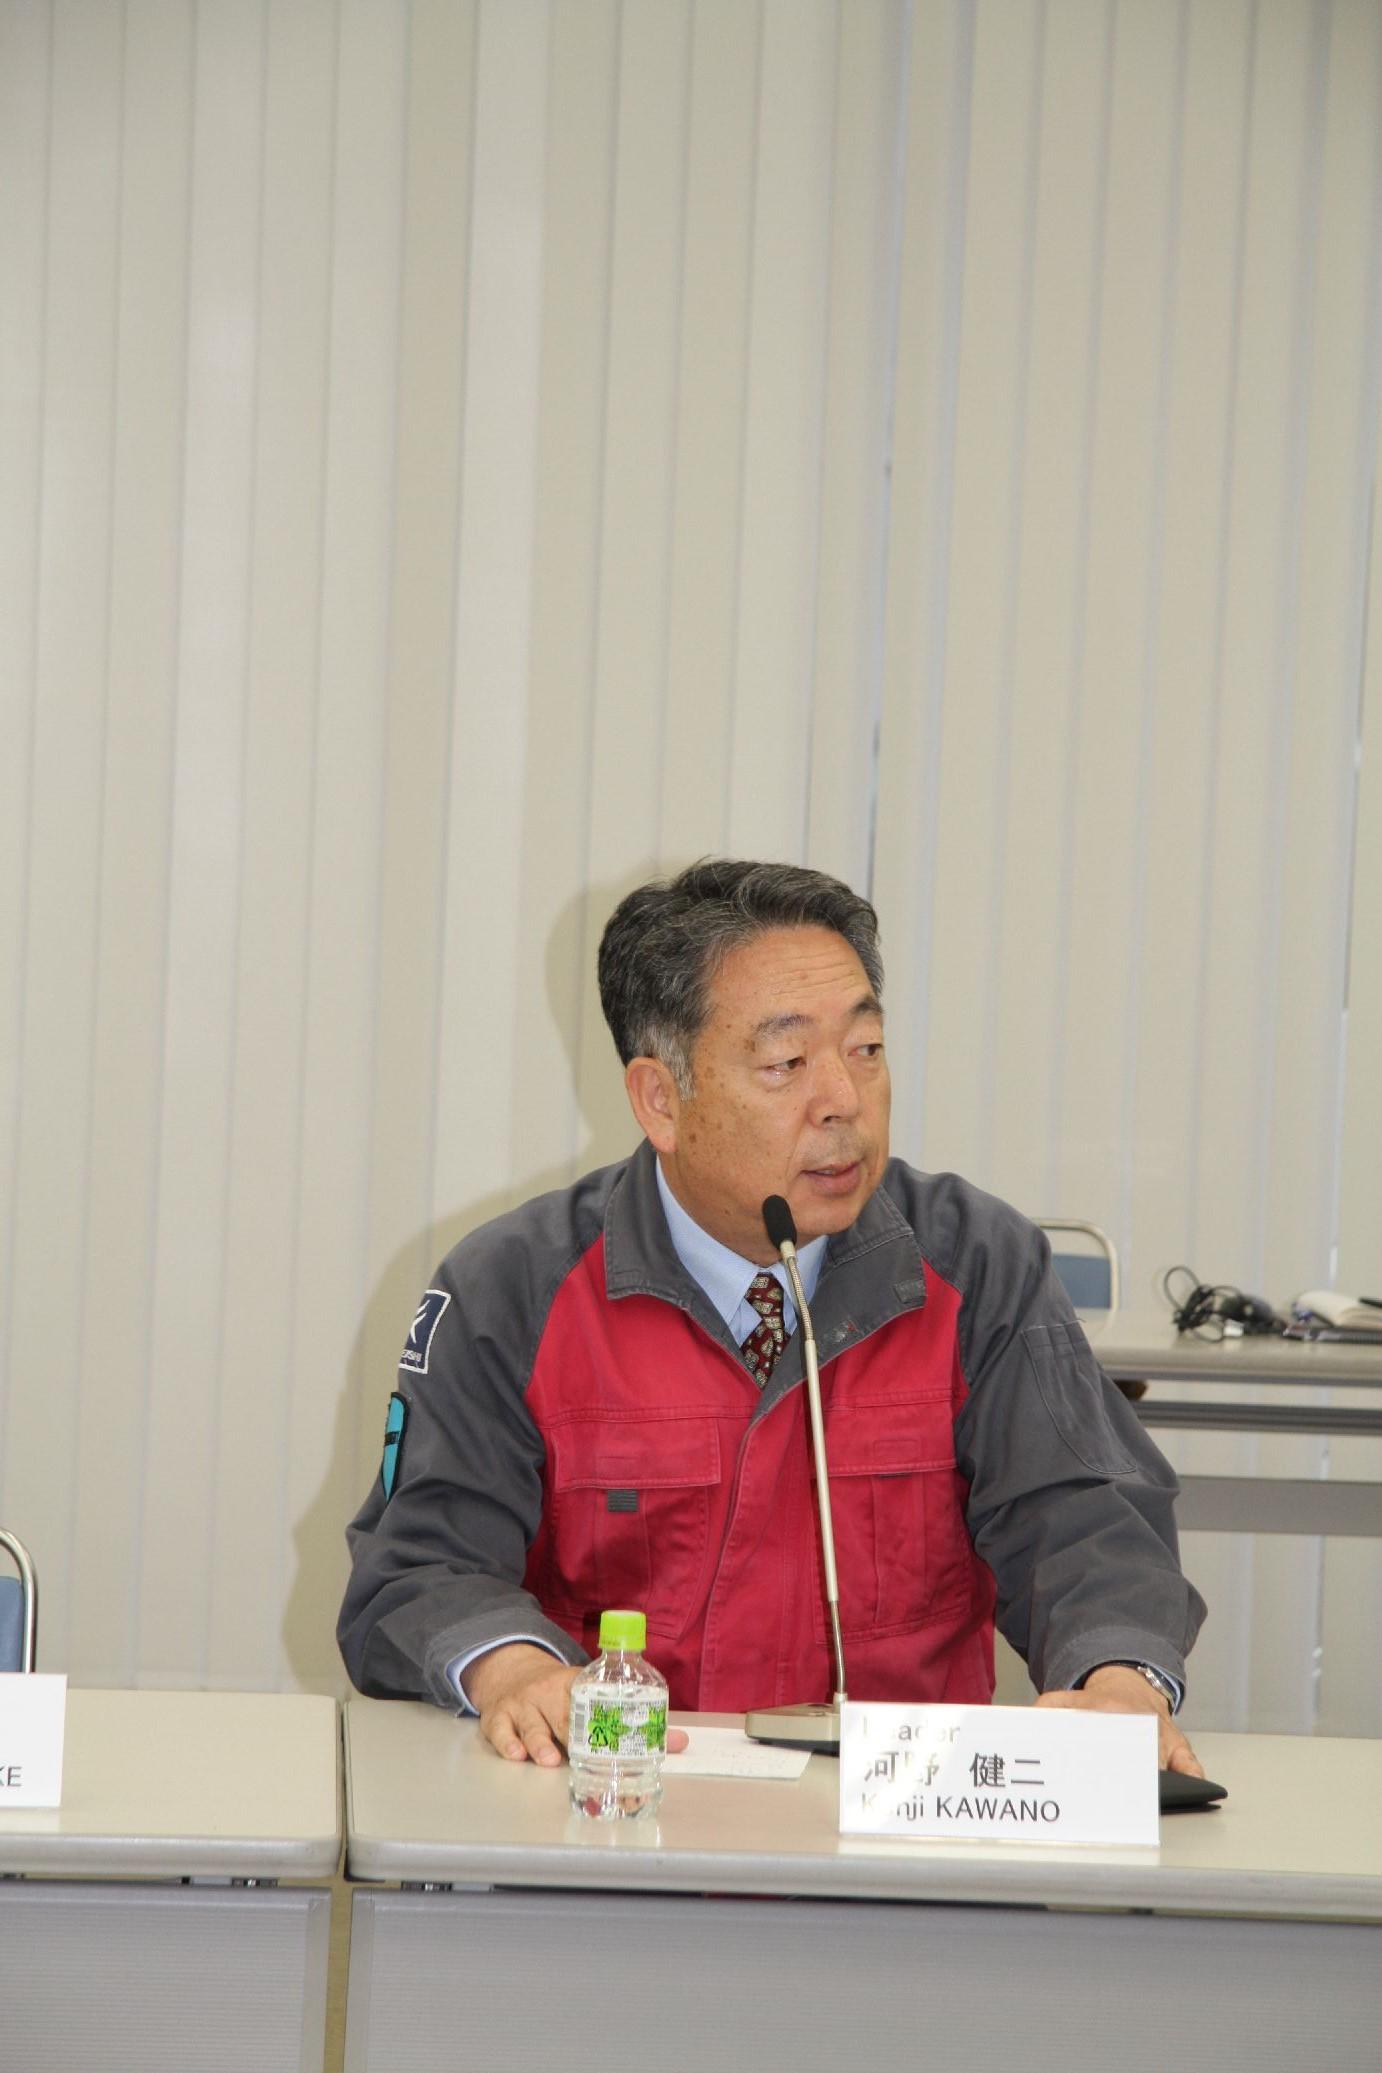 Speech from President Kenji Kawano of TSUNEISHI